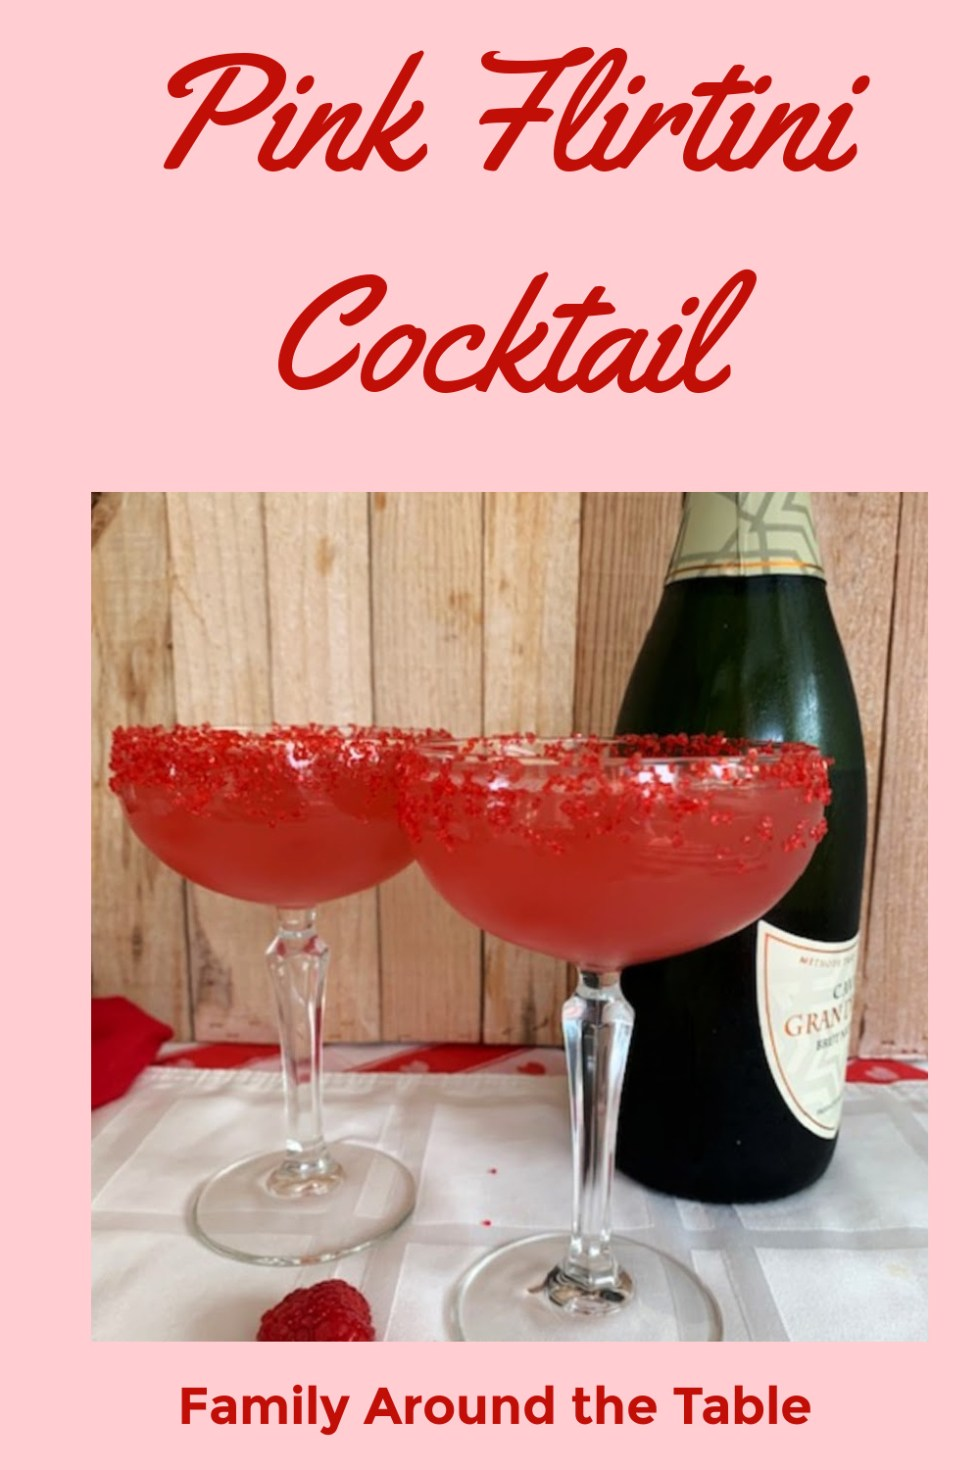 Pink Flirtini Cocktail Pinterest image.